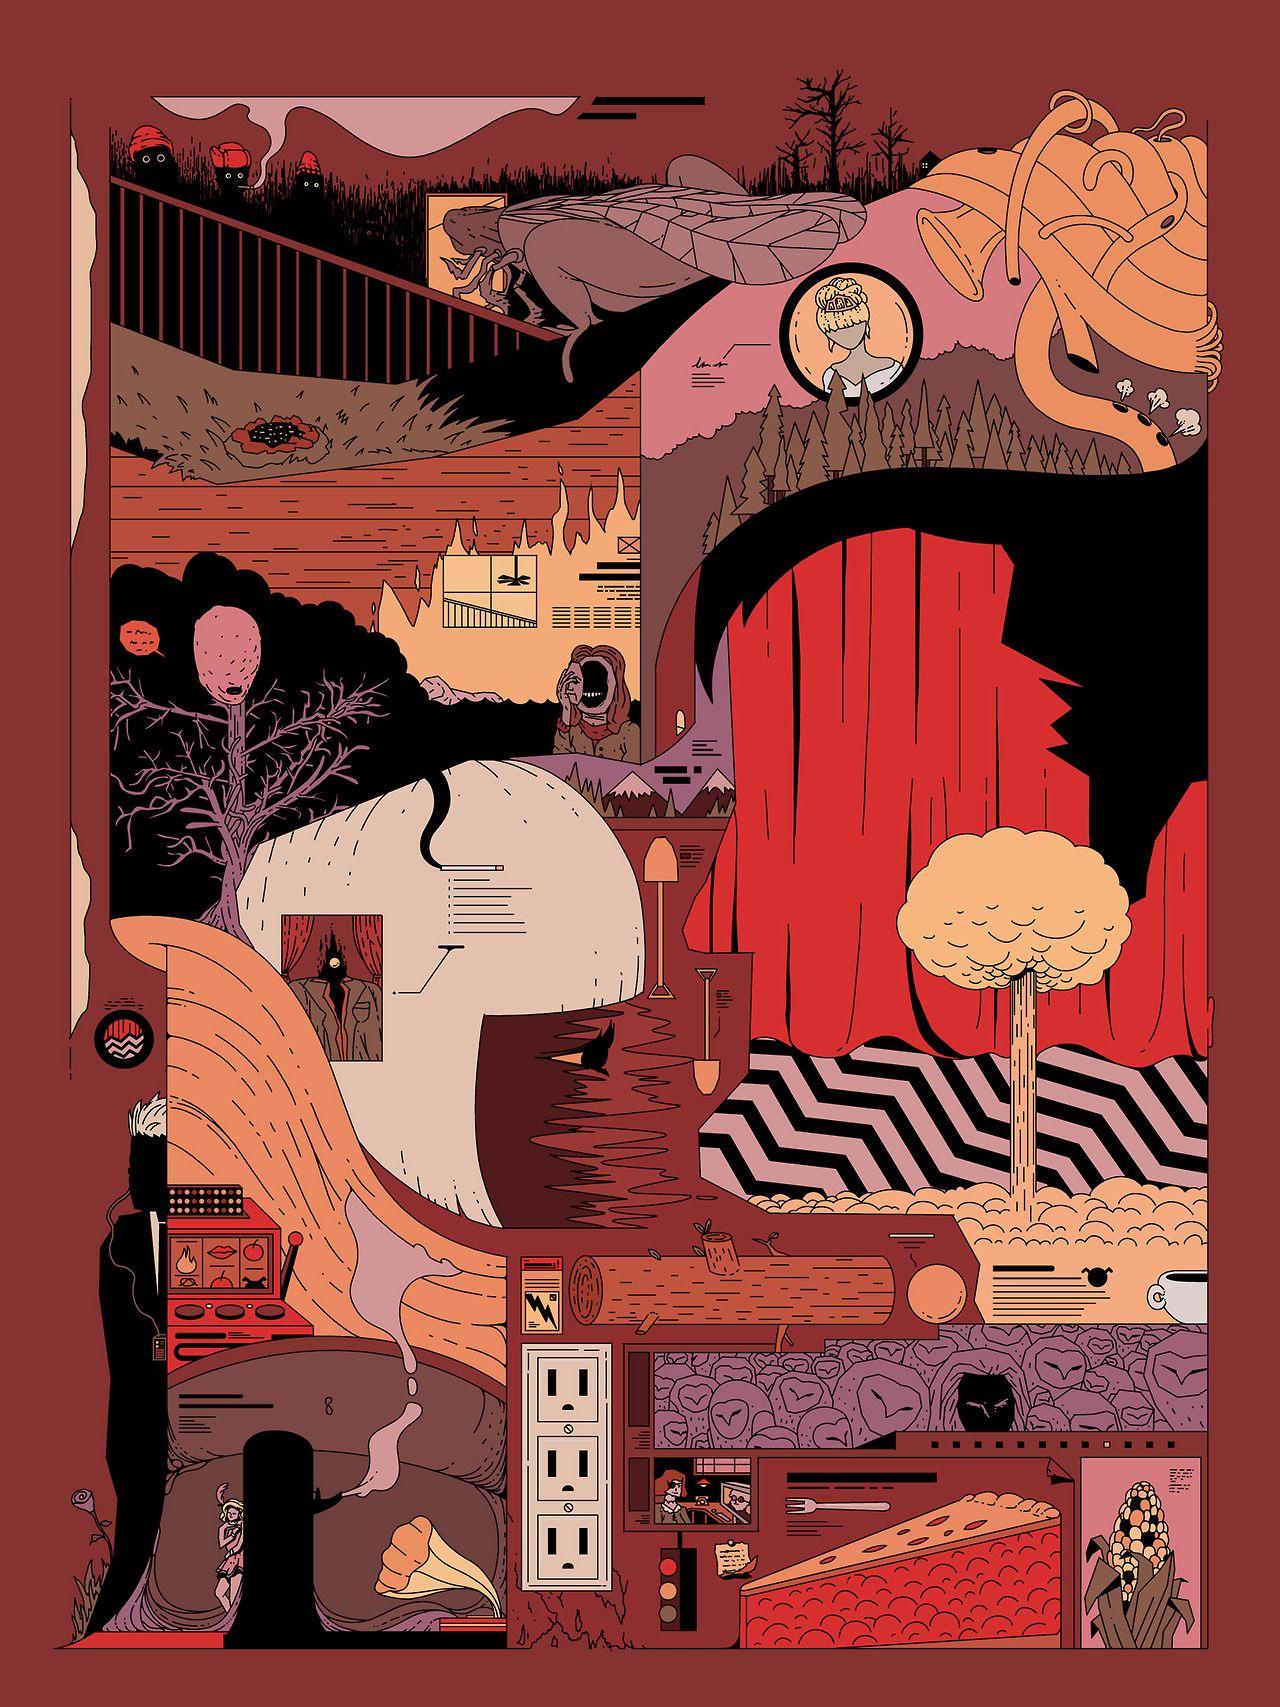 12x18 24x36 Twin Peaks TV Series Shows Season Classic Poster Art Print